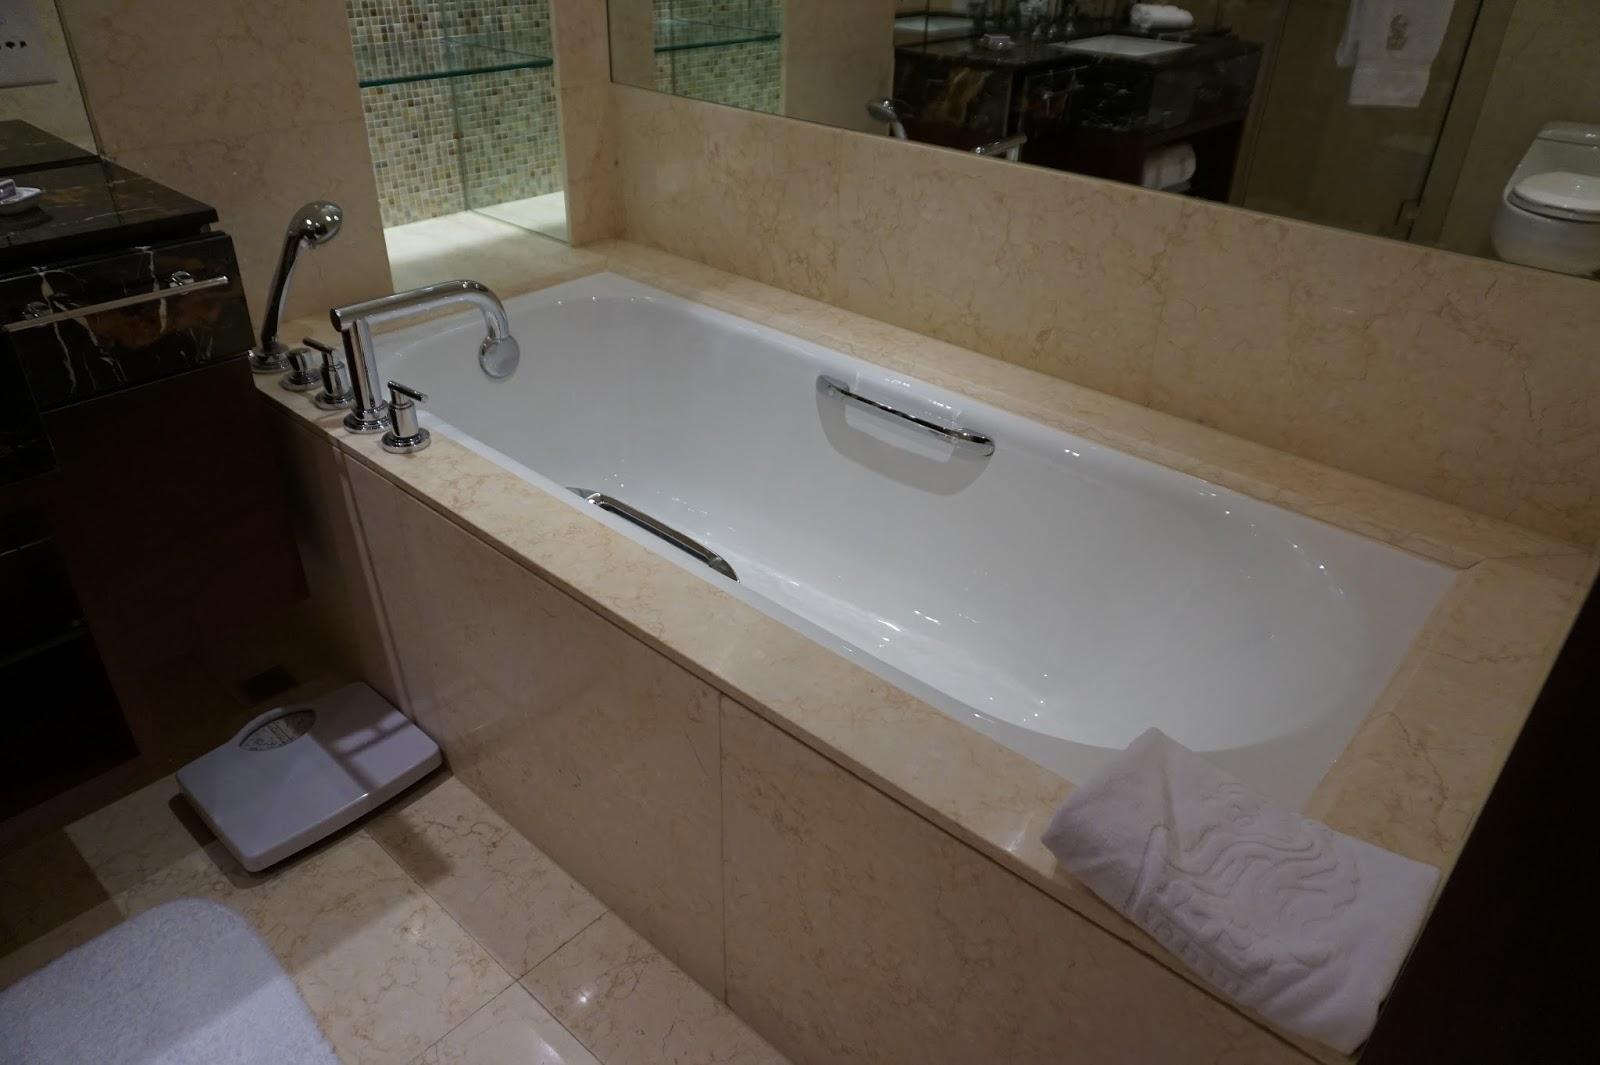 portman ritz-carlton shanghai china prc hotel review deluxe room bathroom